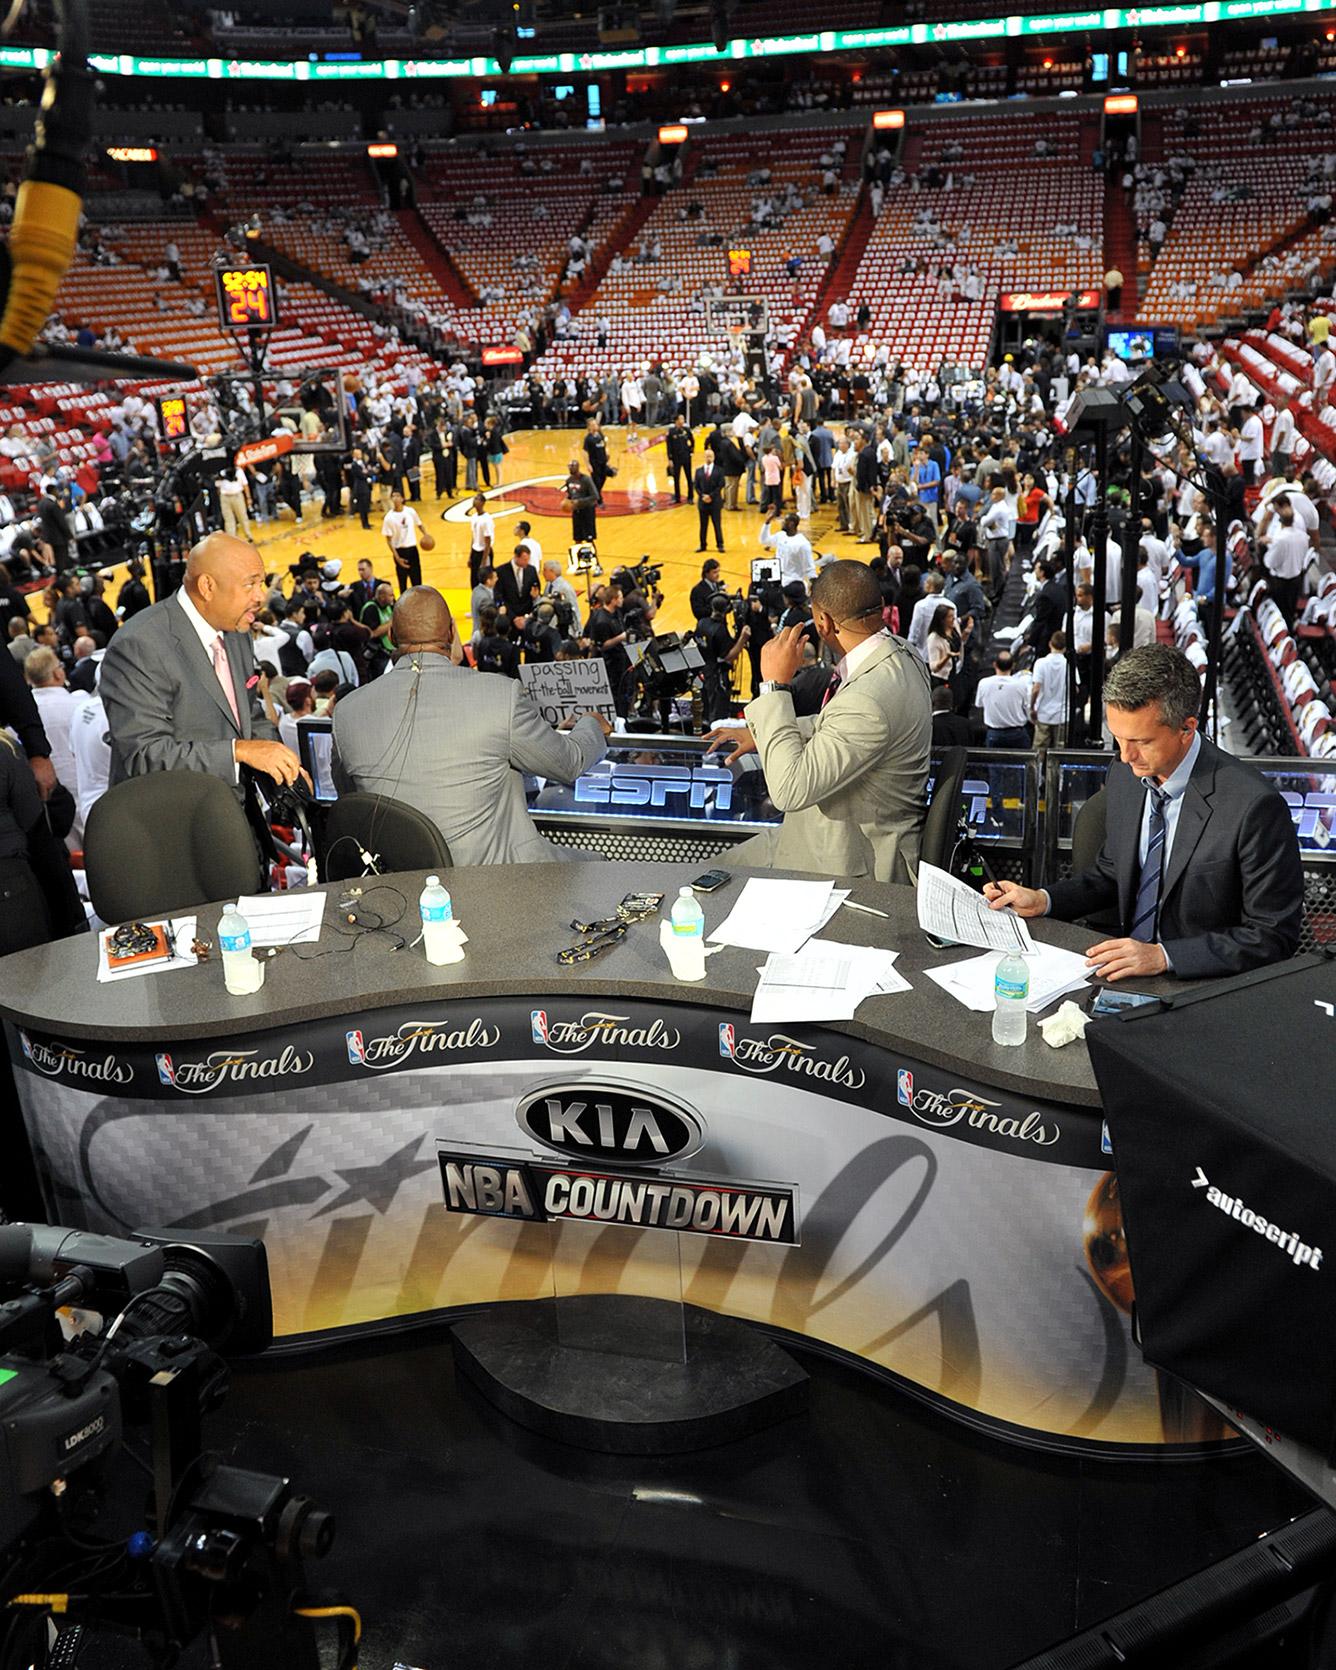 KIA NBA Countdown